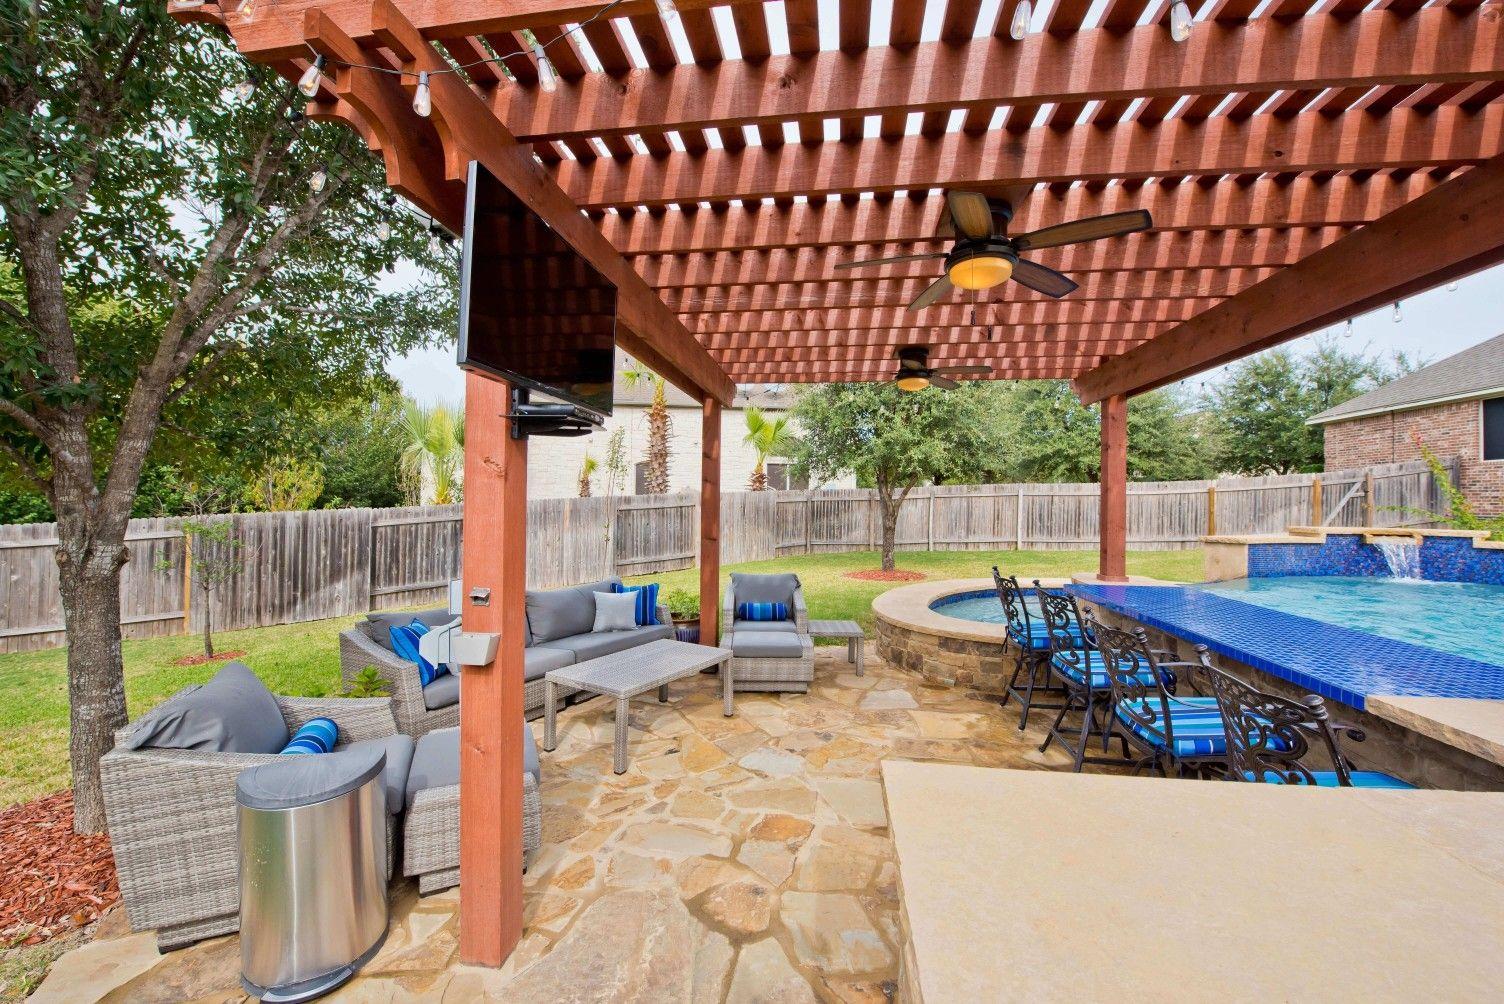 Austin Outdoor Living Photos Outdoor Kitchens Fireplaces San Antonio Pergola Outdoor Living